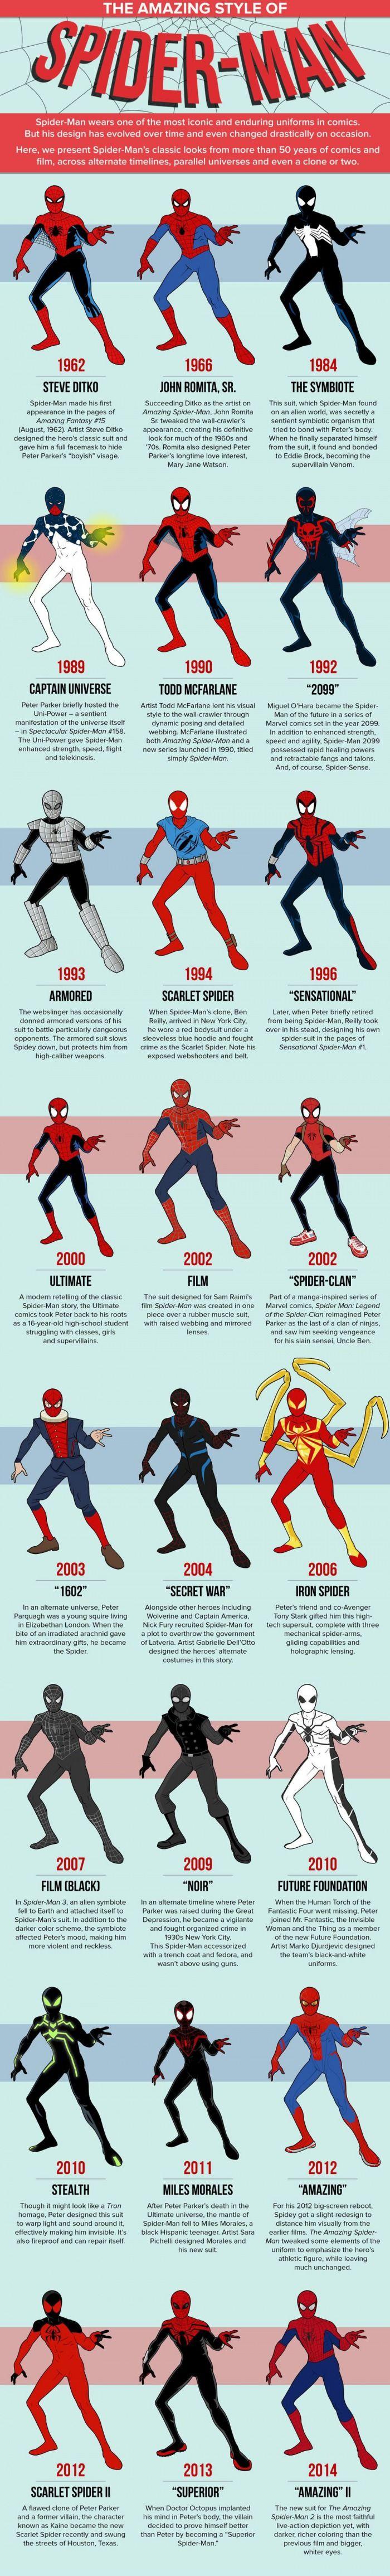 Evolution of Spiday #spiderman